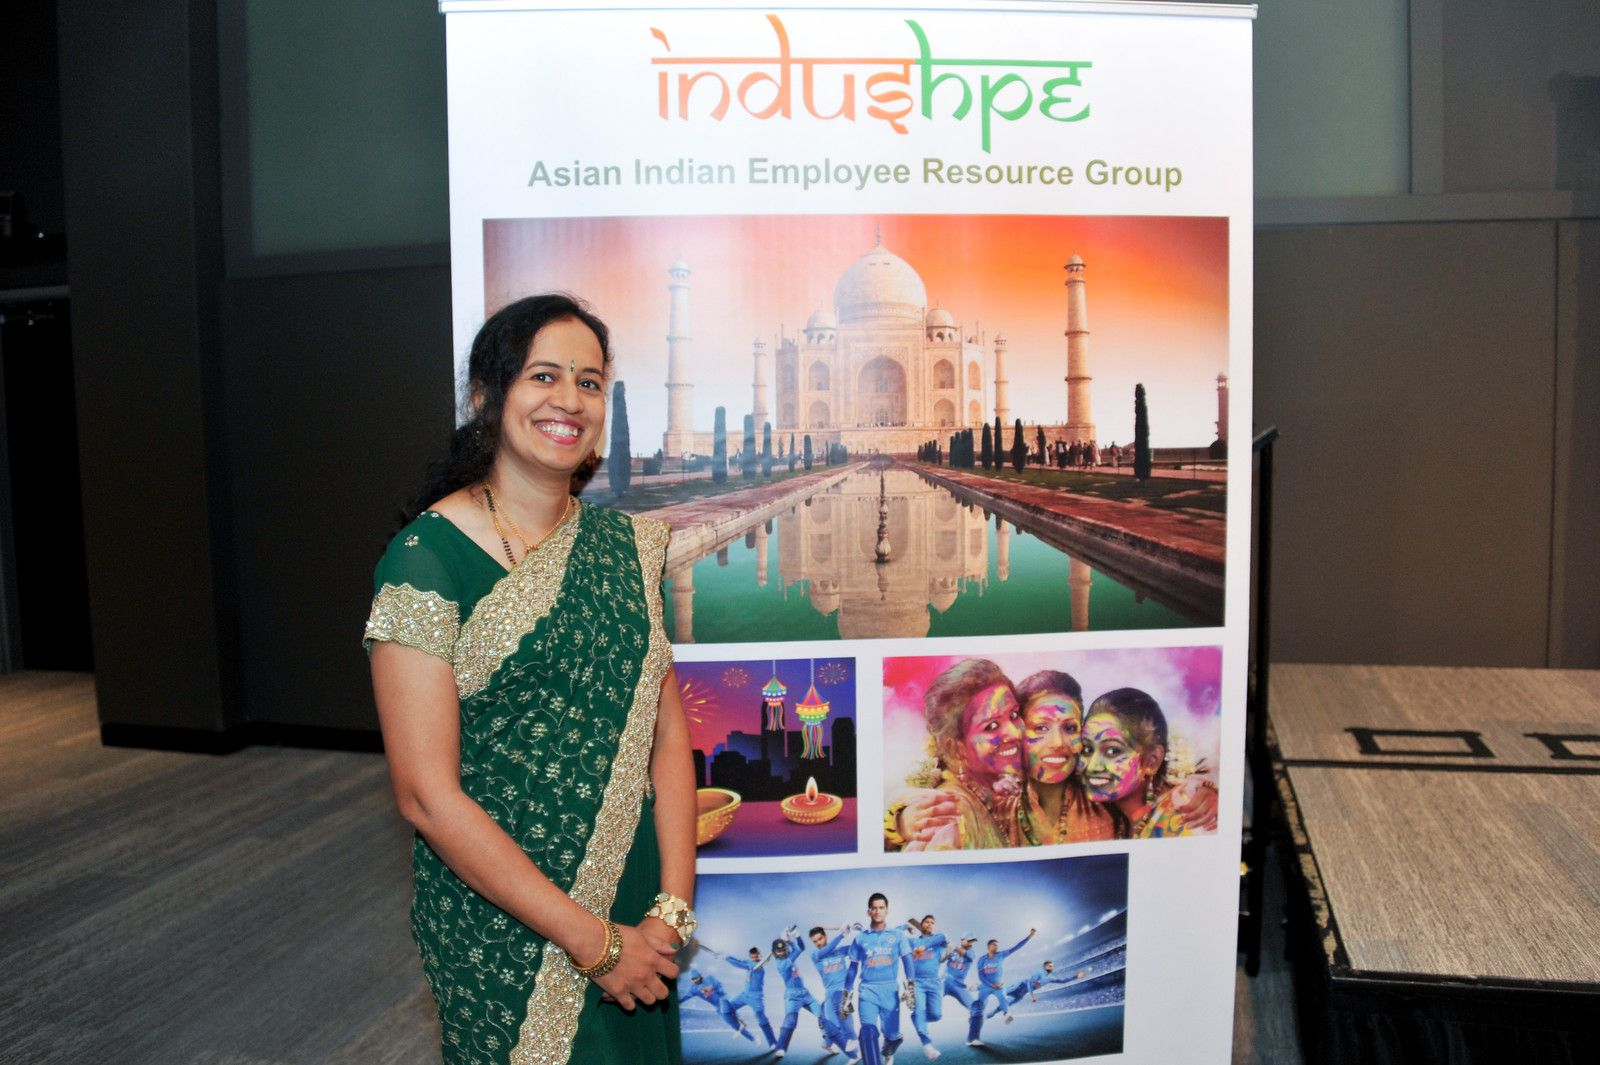 indushpe Asian Indian Employee Resource Group